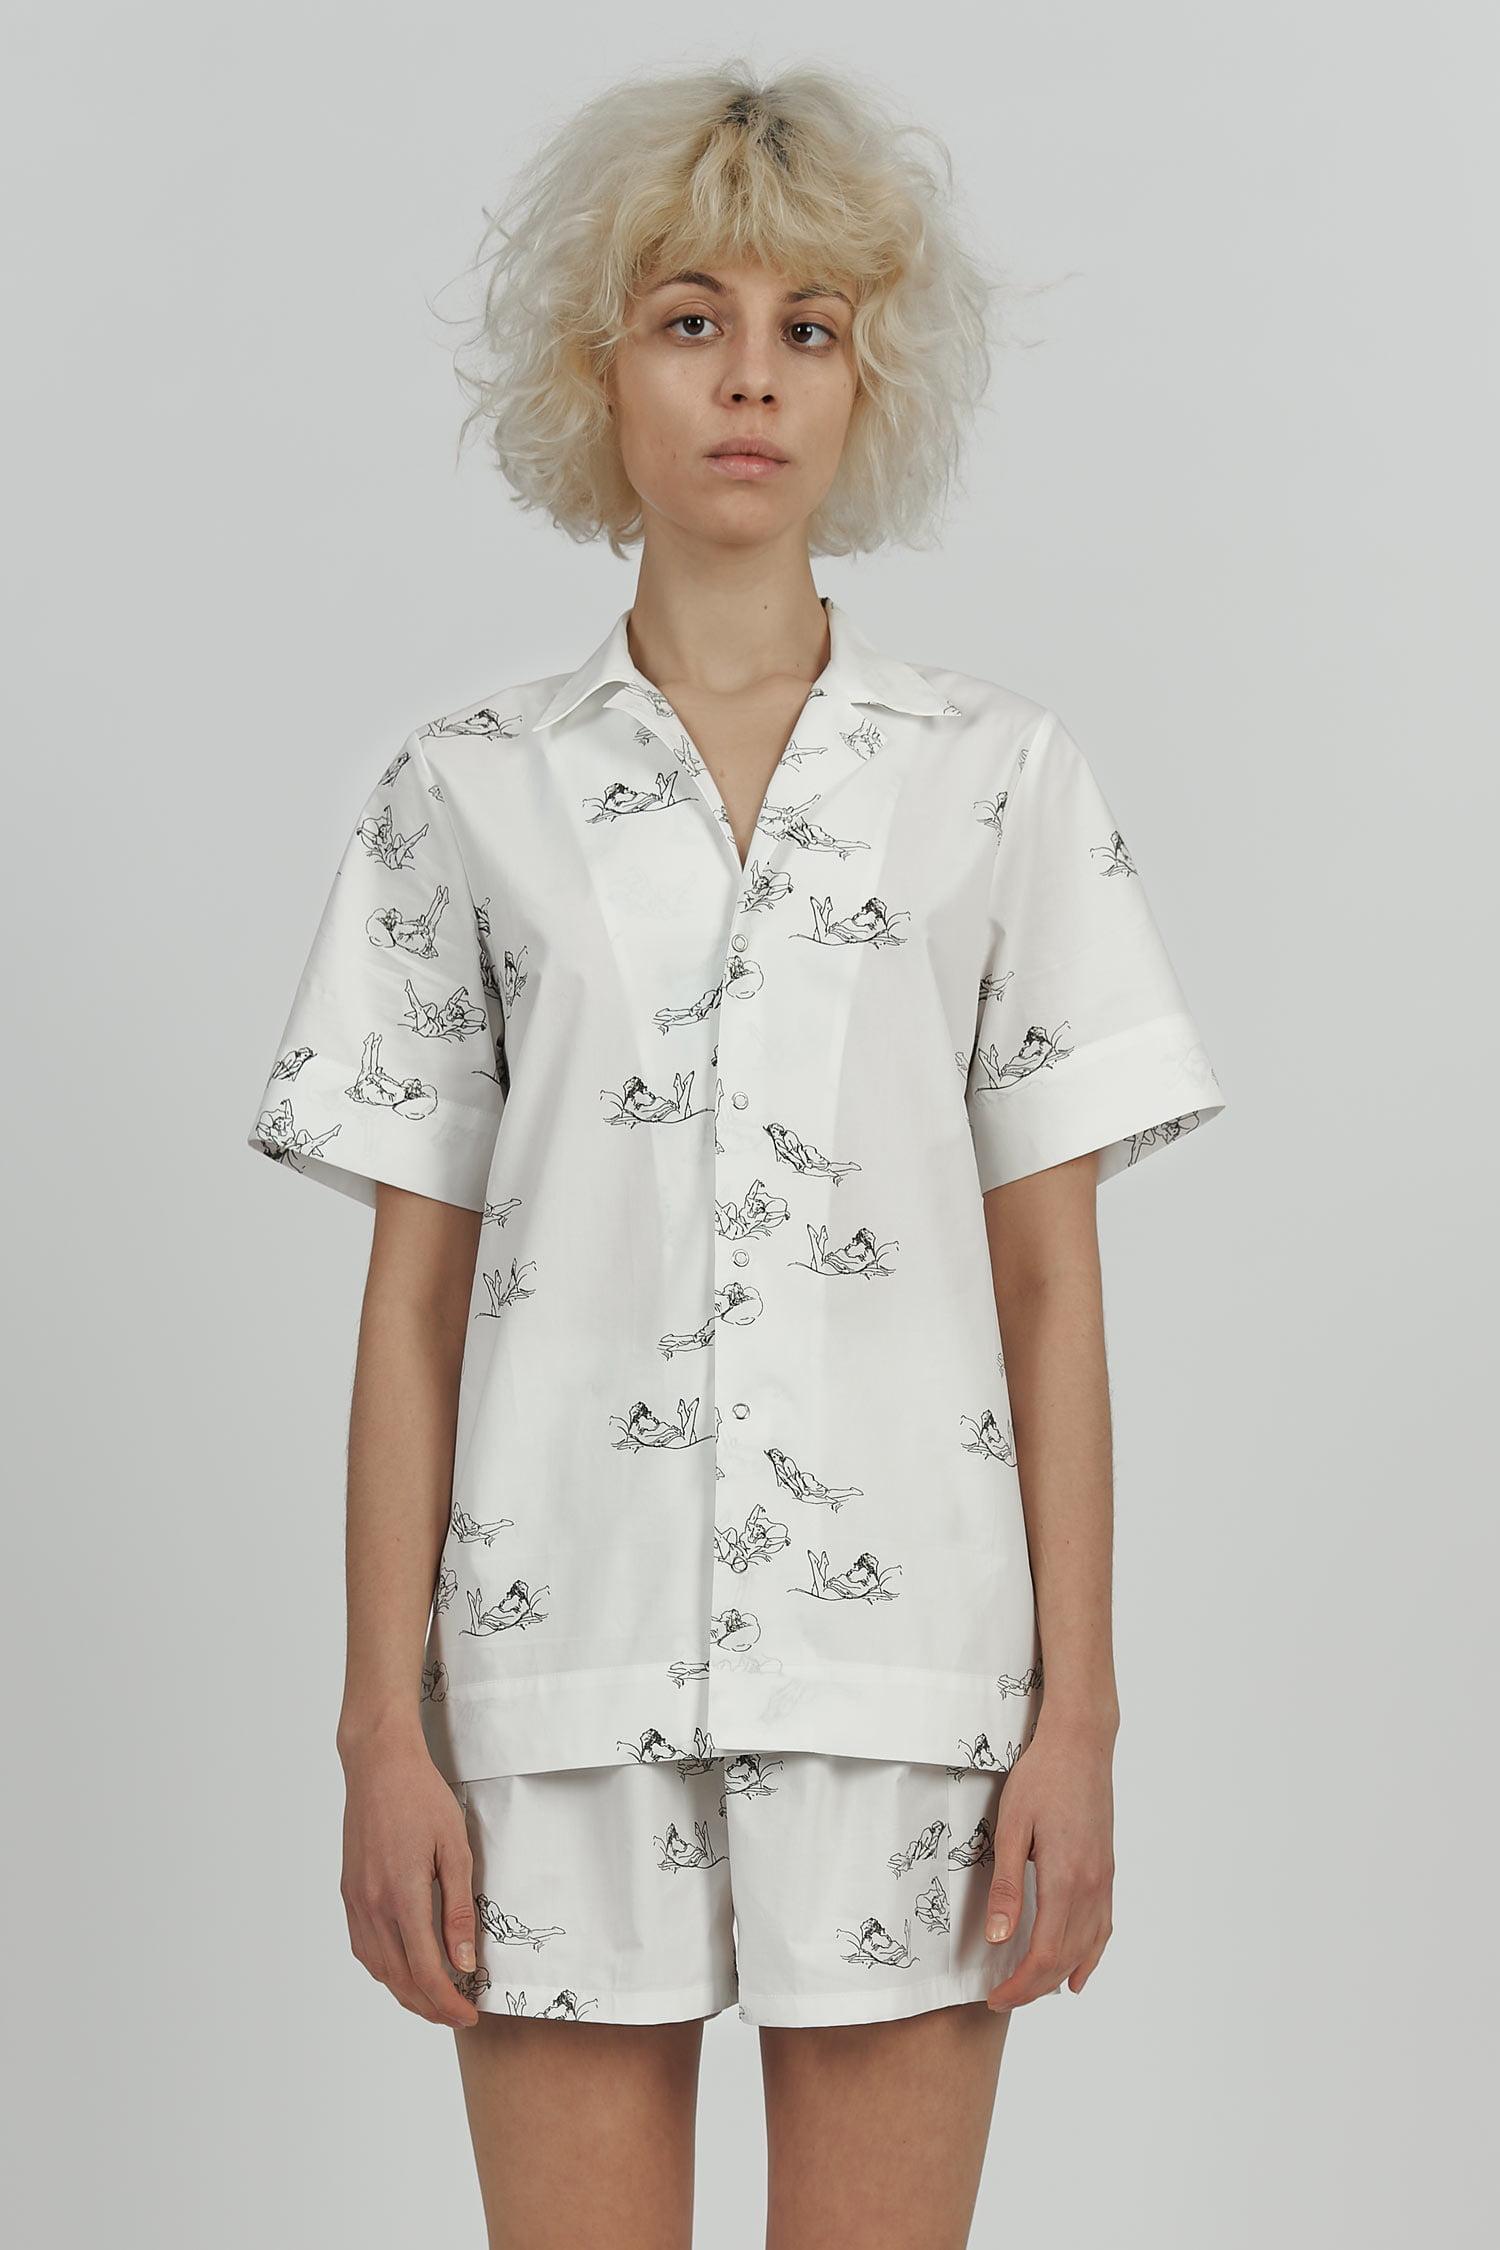 Acephala Hysteria Pyjamas Print Cotton Loose Front Crop